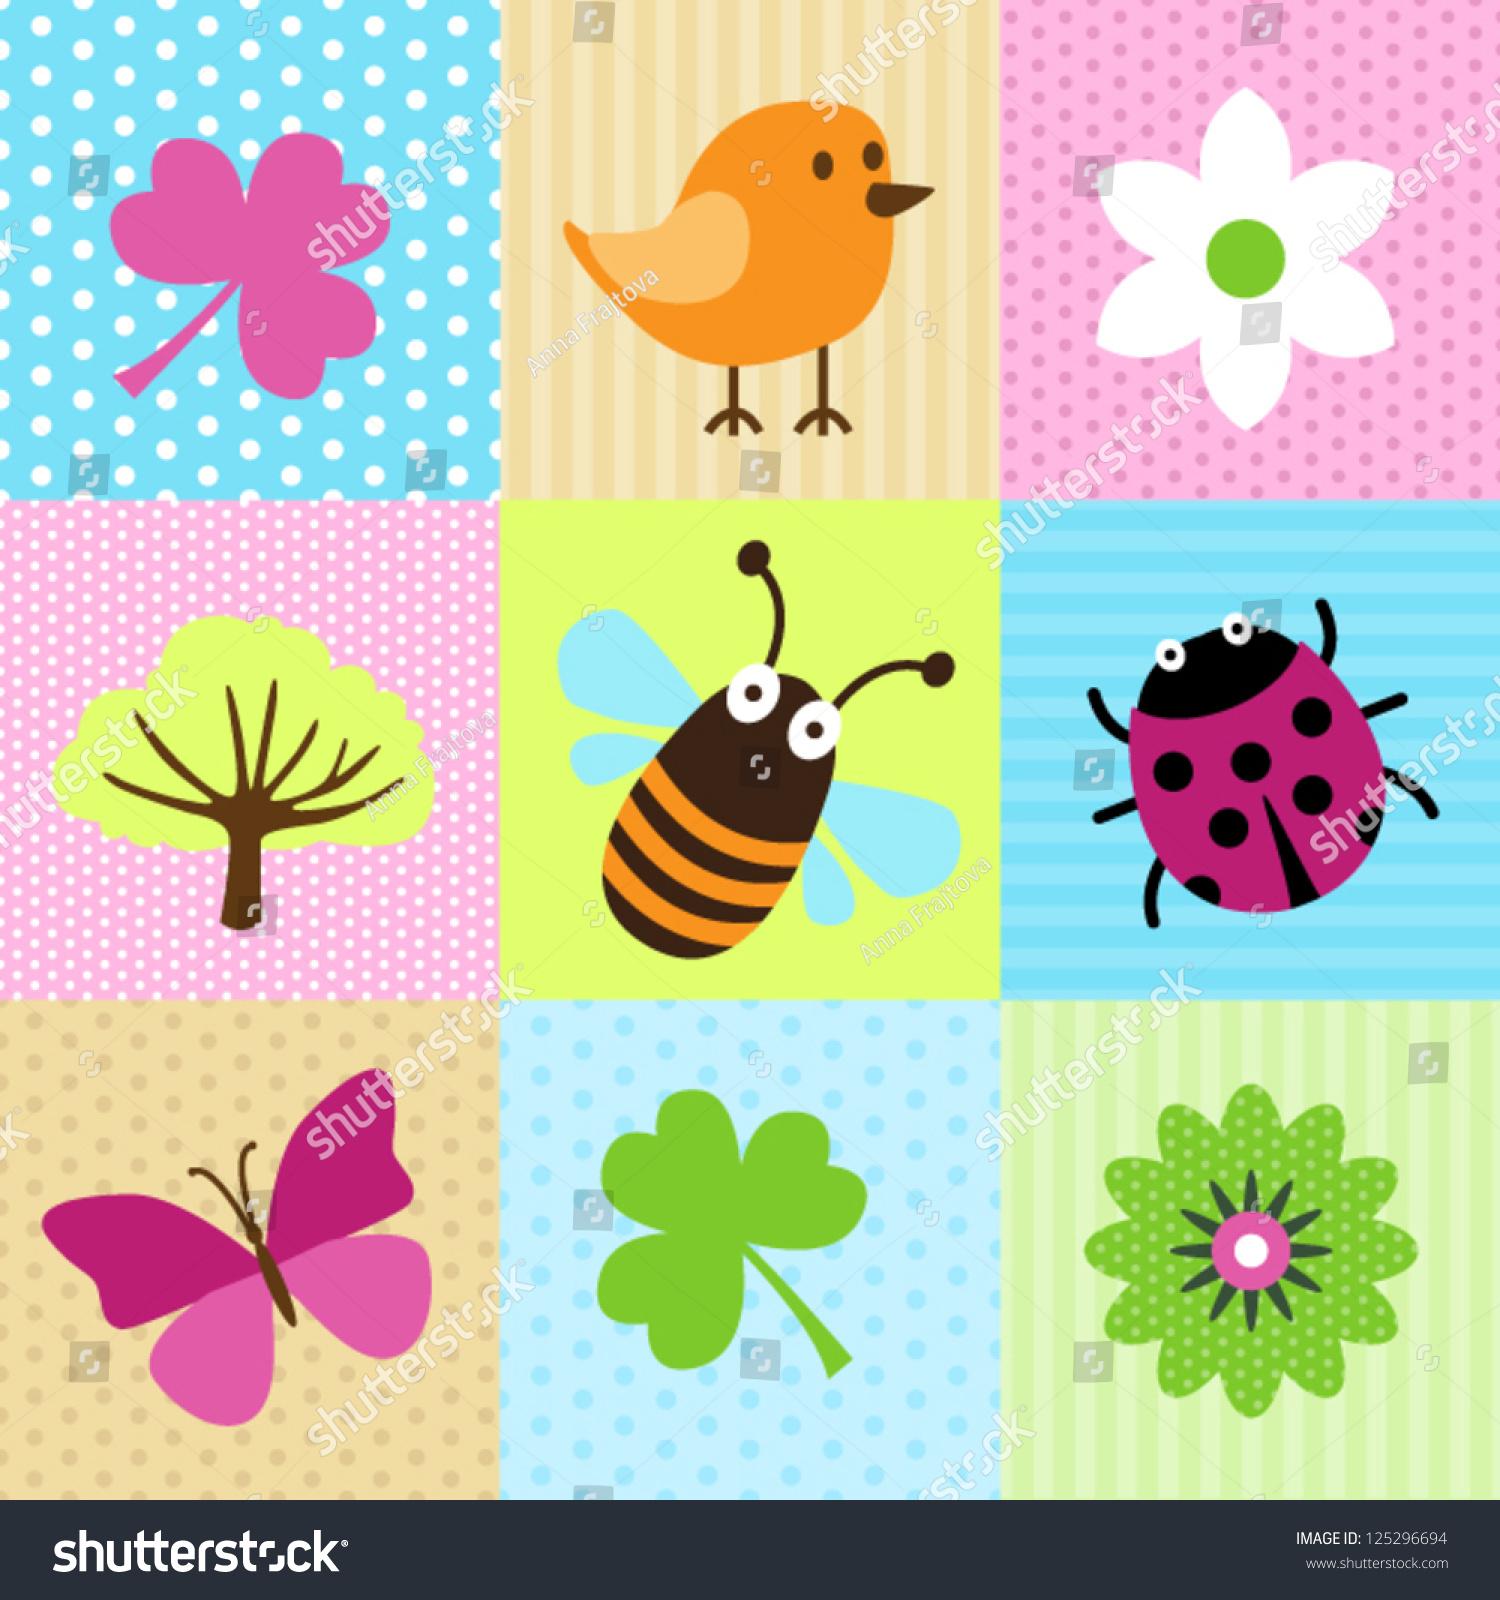 Spring Cartoons Web Print Stock Vector (Royalty Free) 125296694 ...